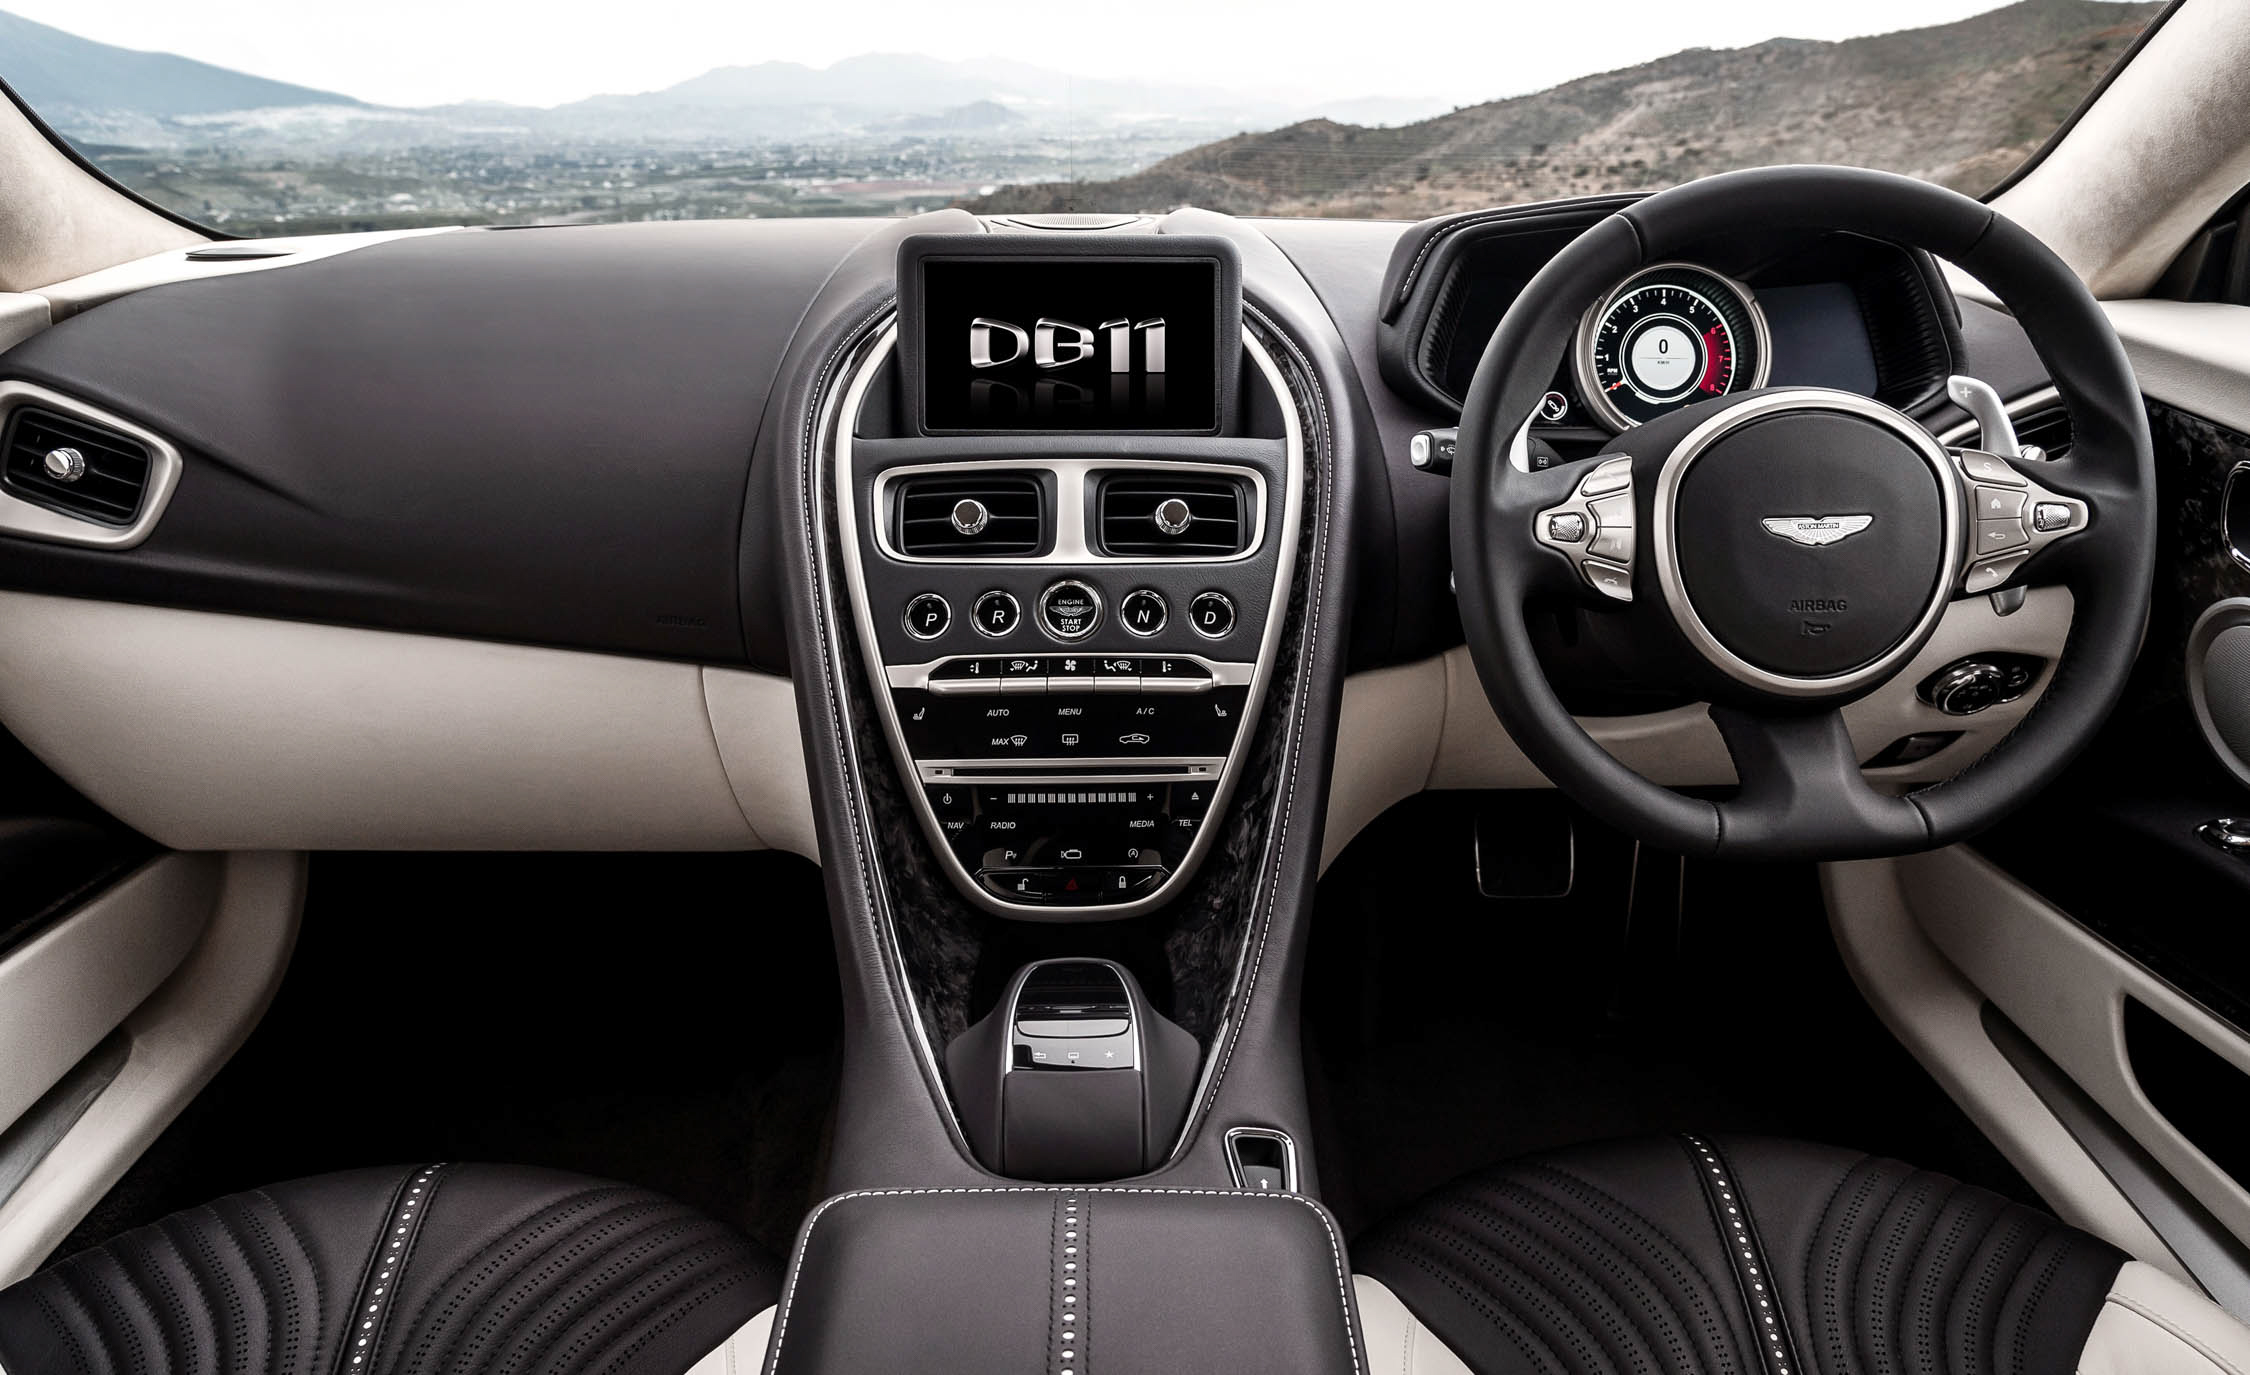 2017 Aston Martin Db11 Interior Dashboard (View 11 of 22)